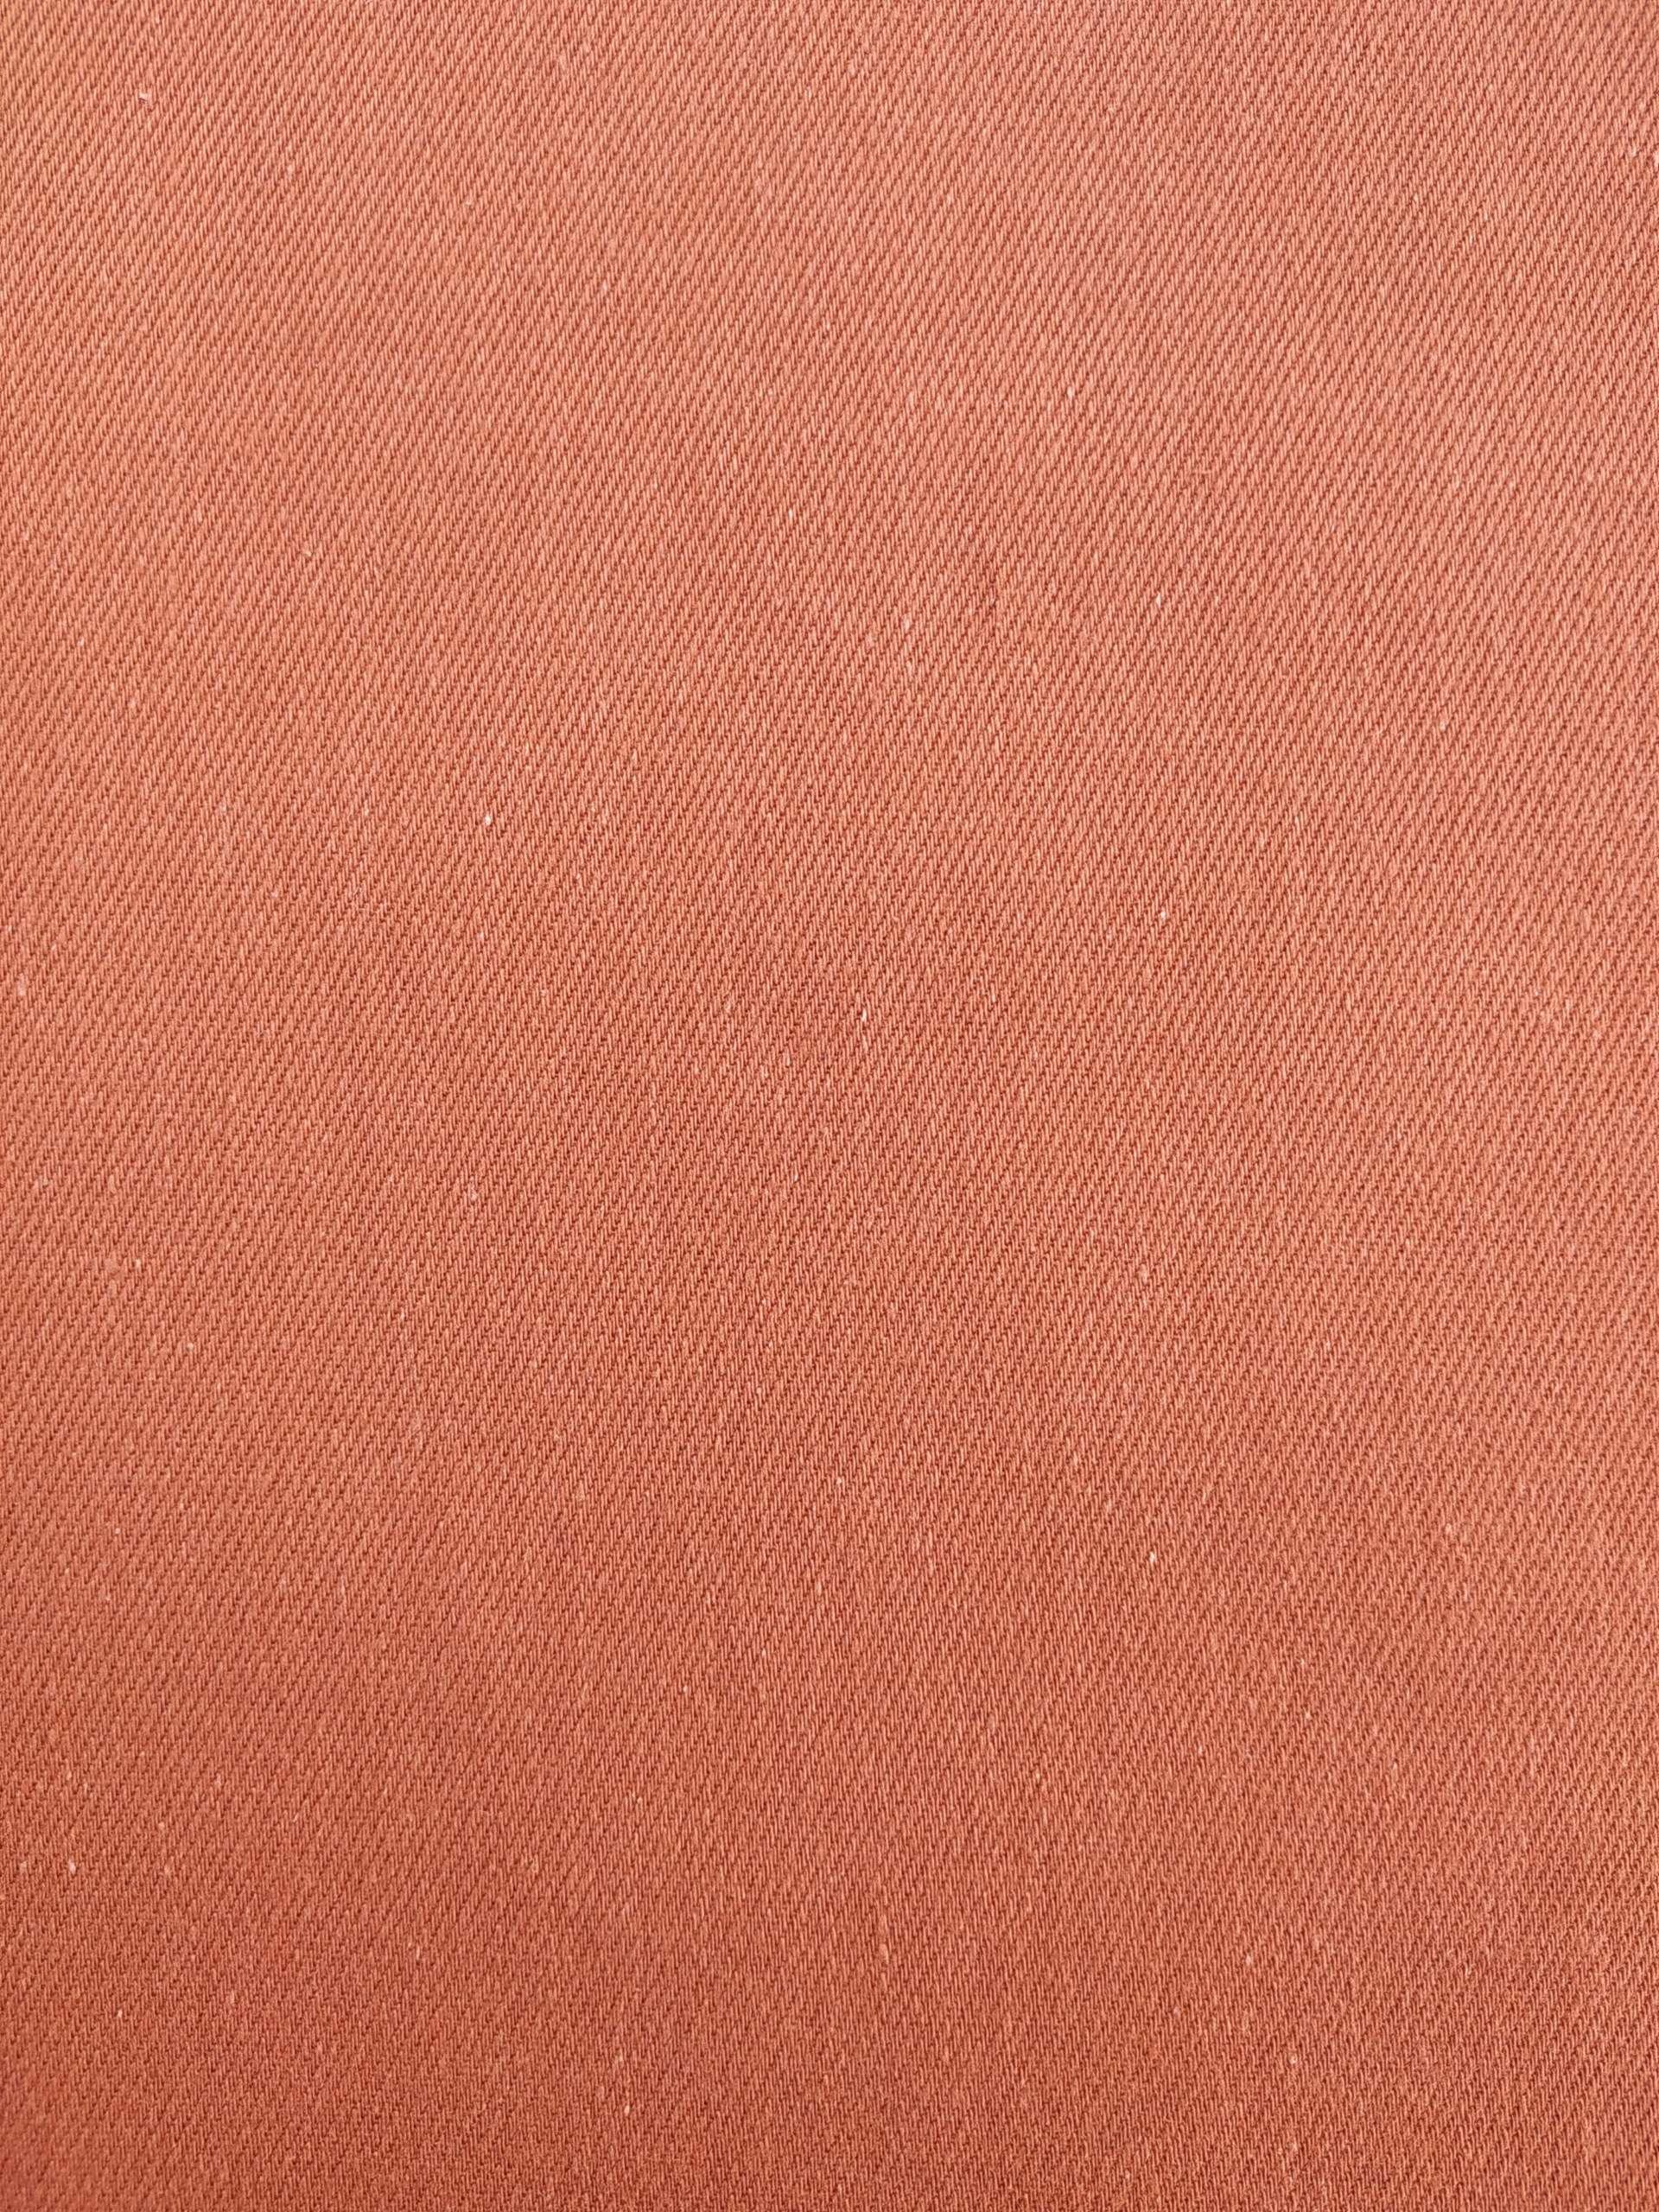 marrón teja